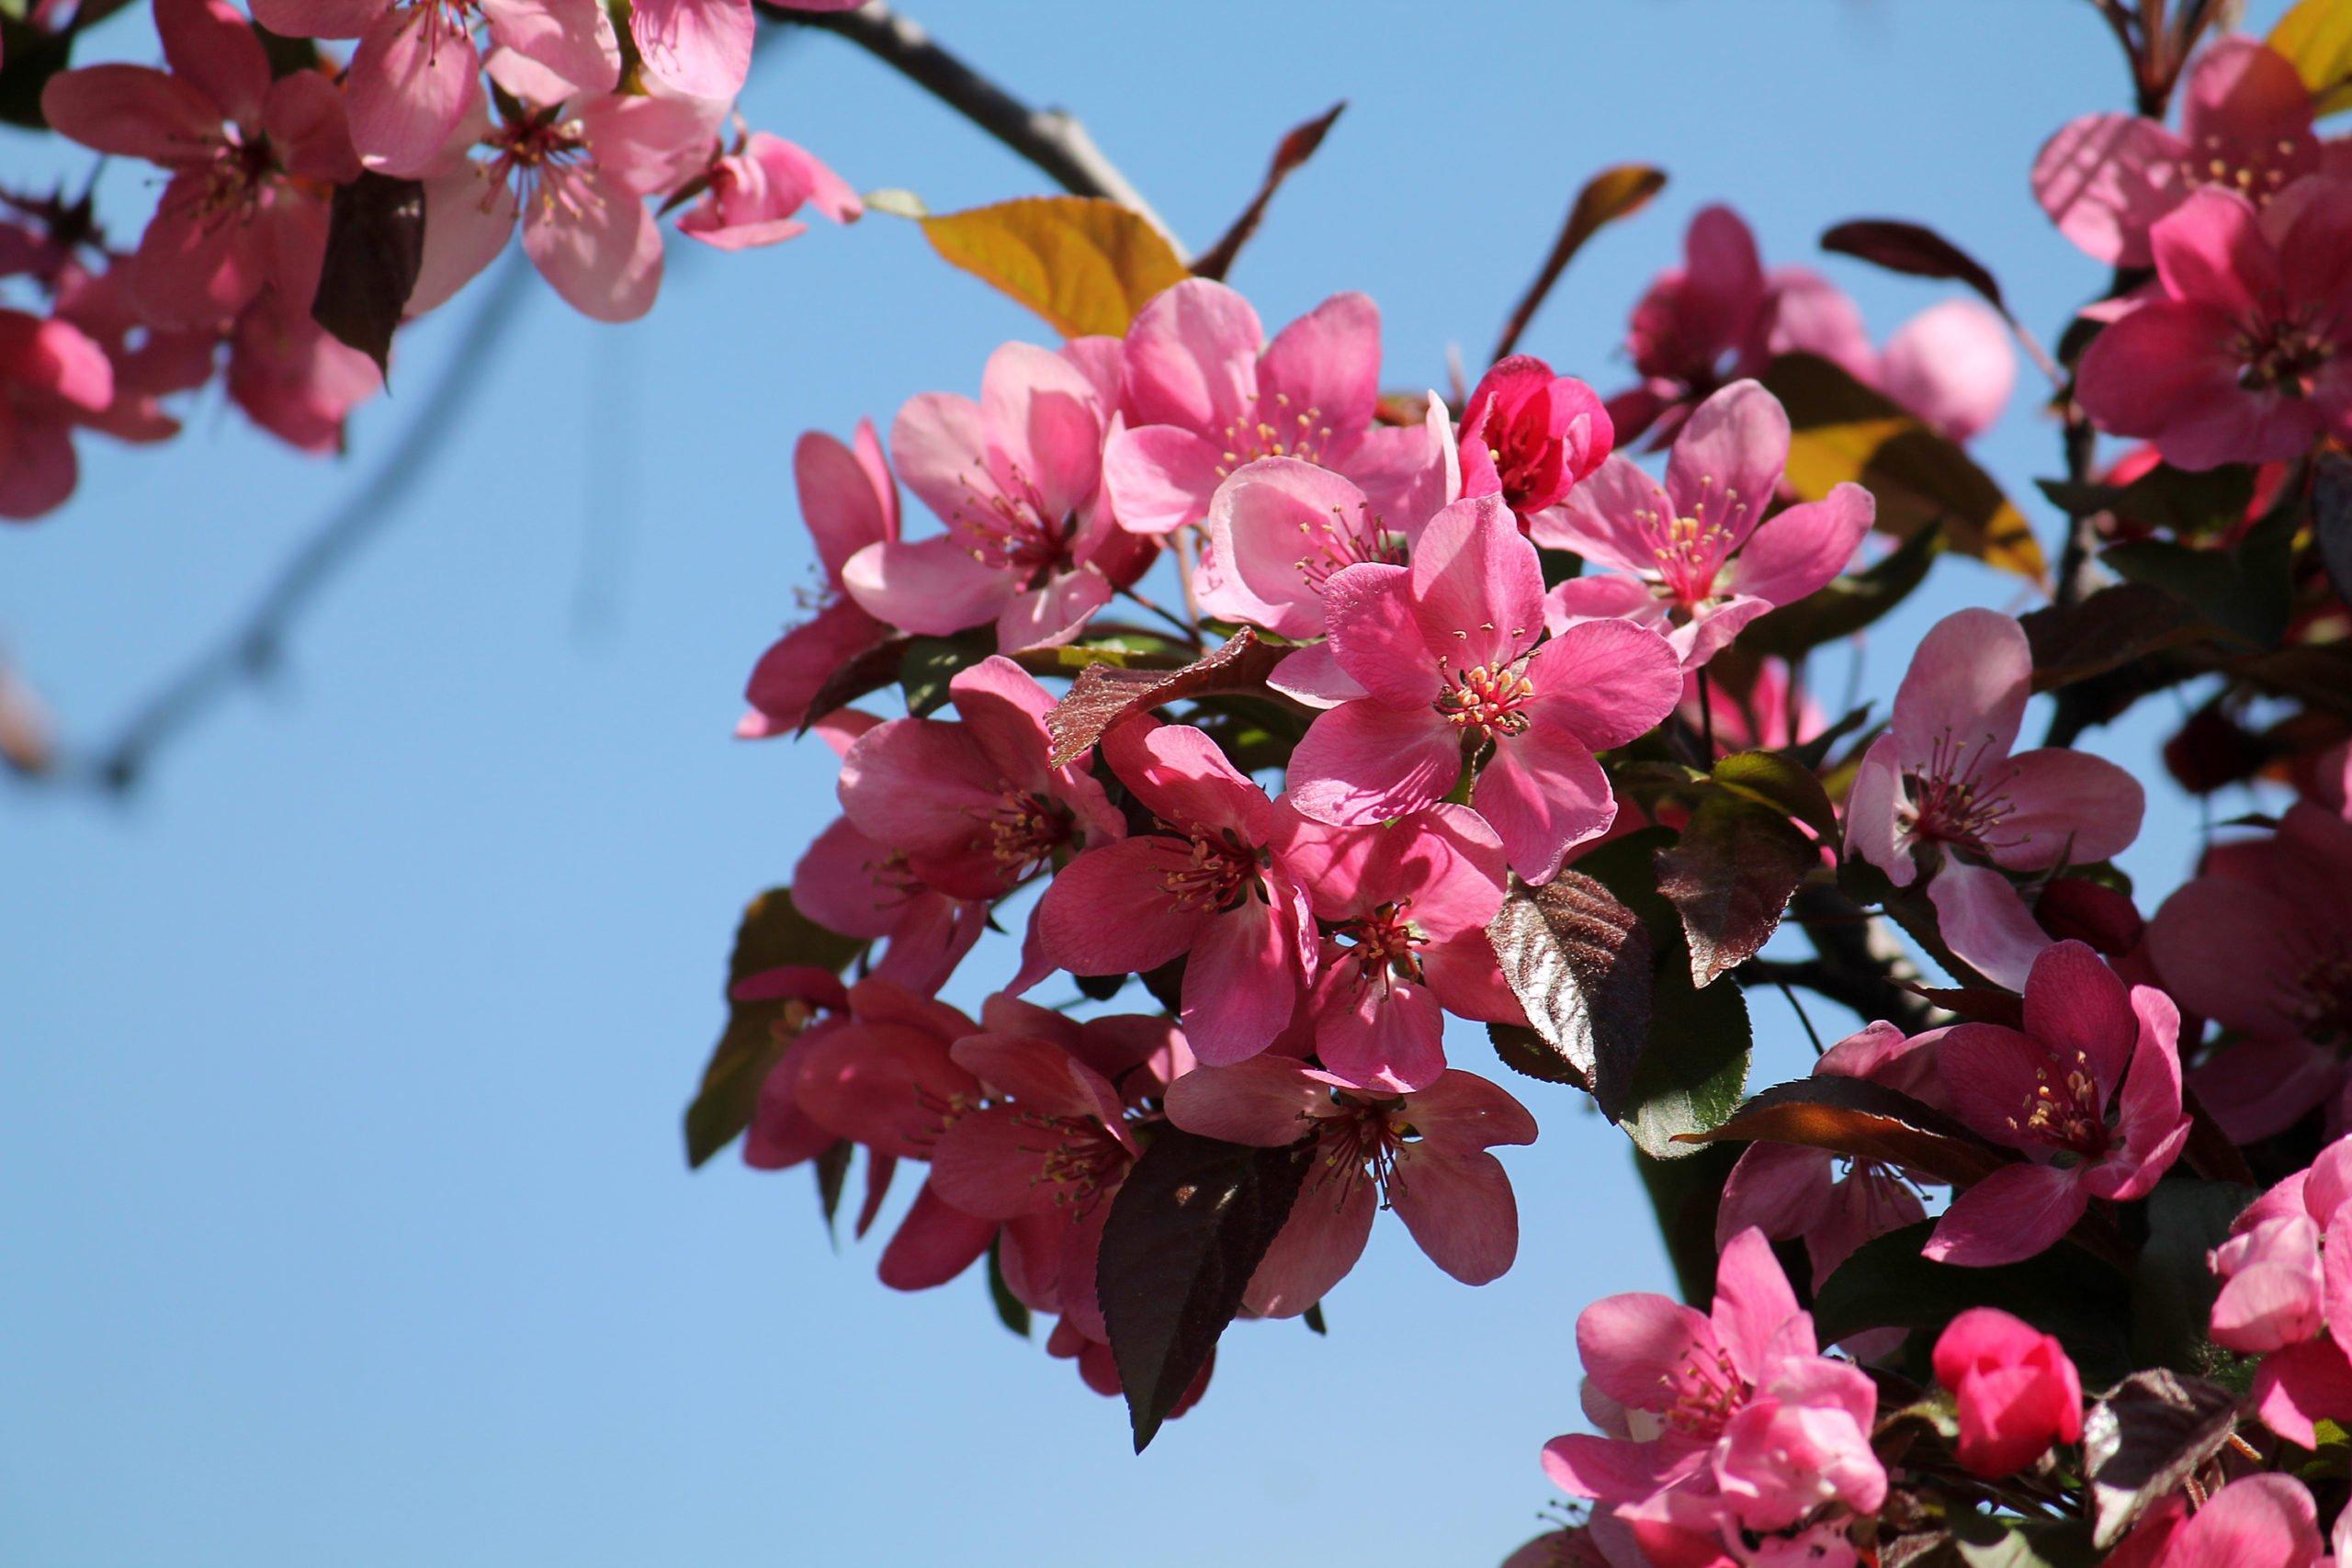 Pian ilmestyy kevään 2020 Ihana Piha!